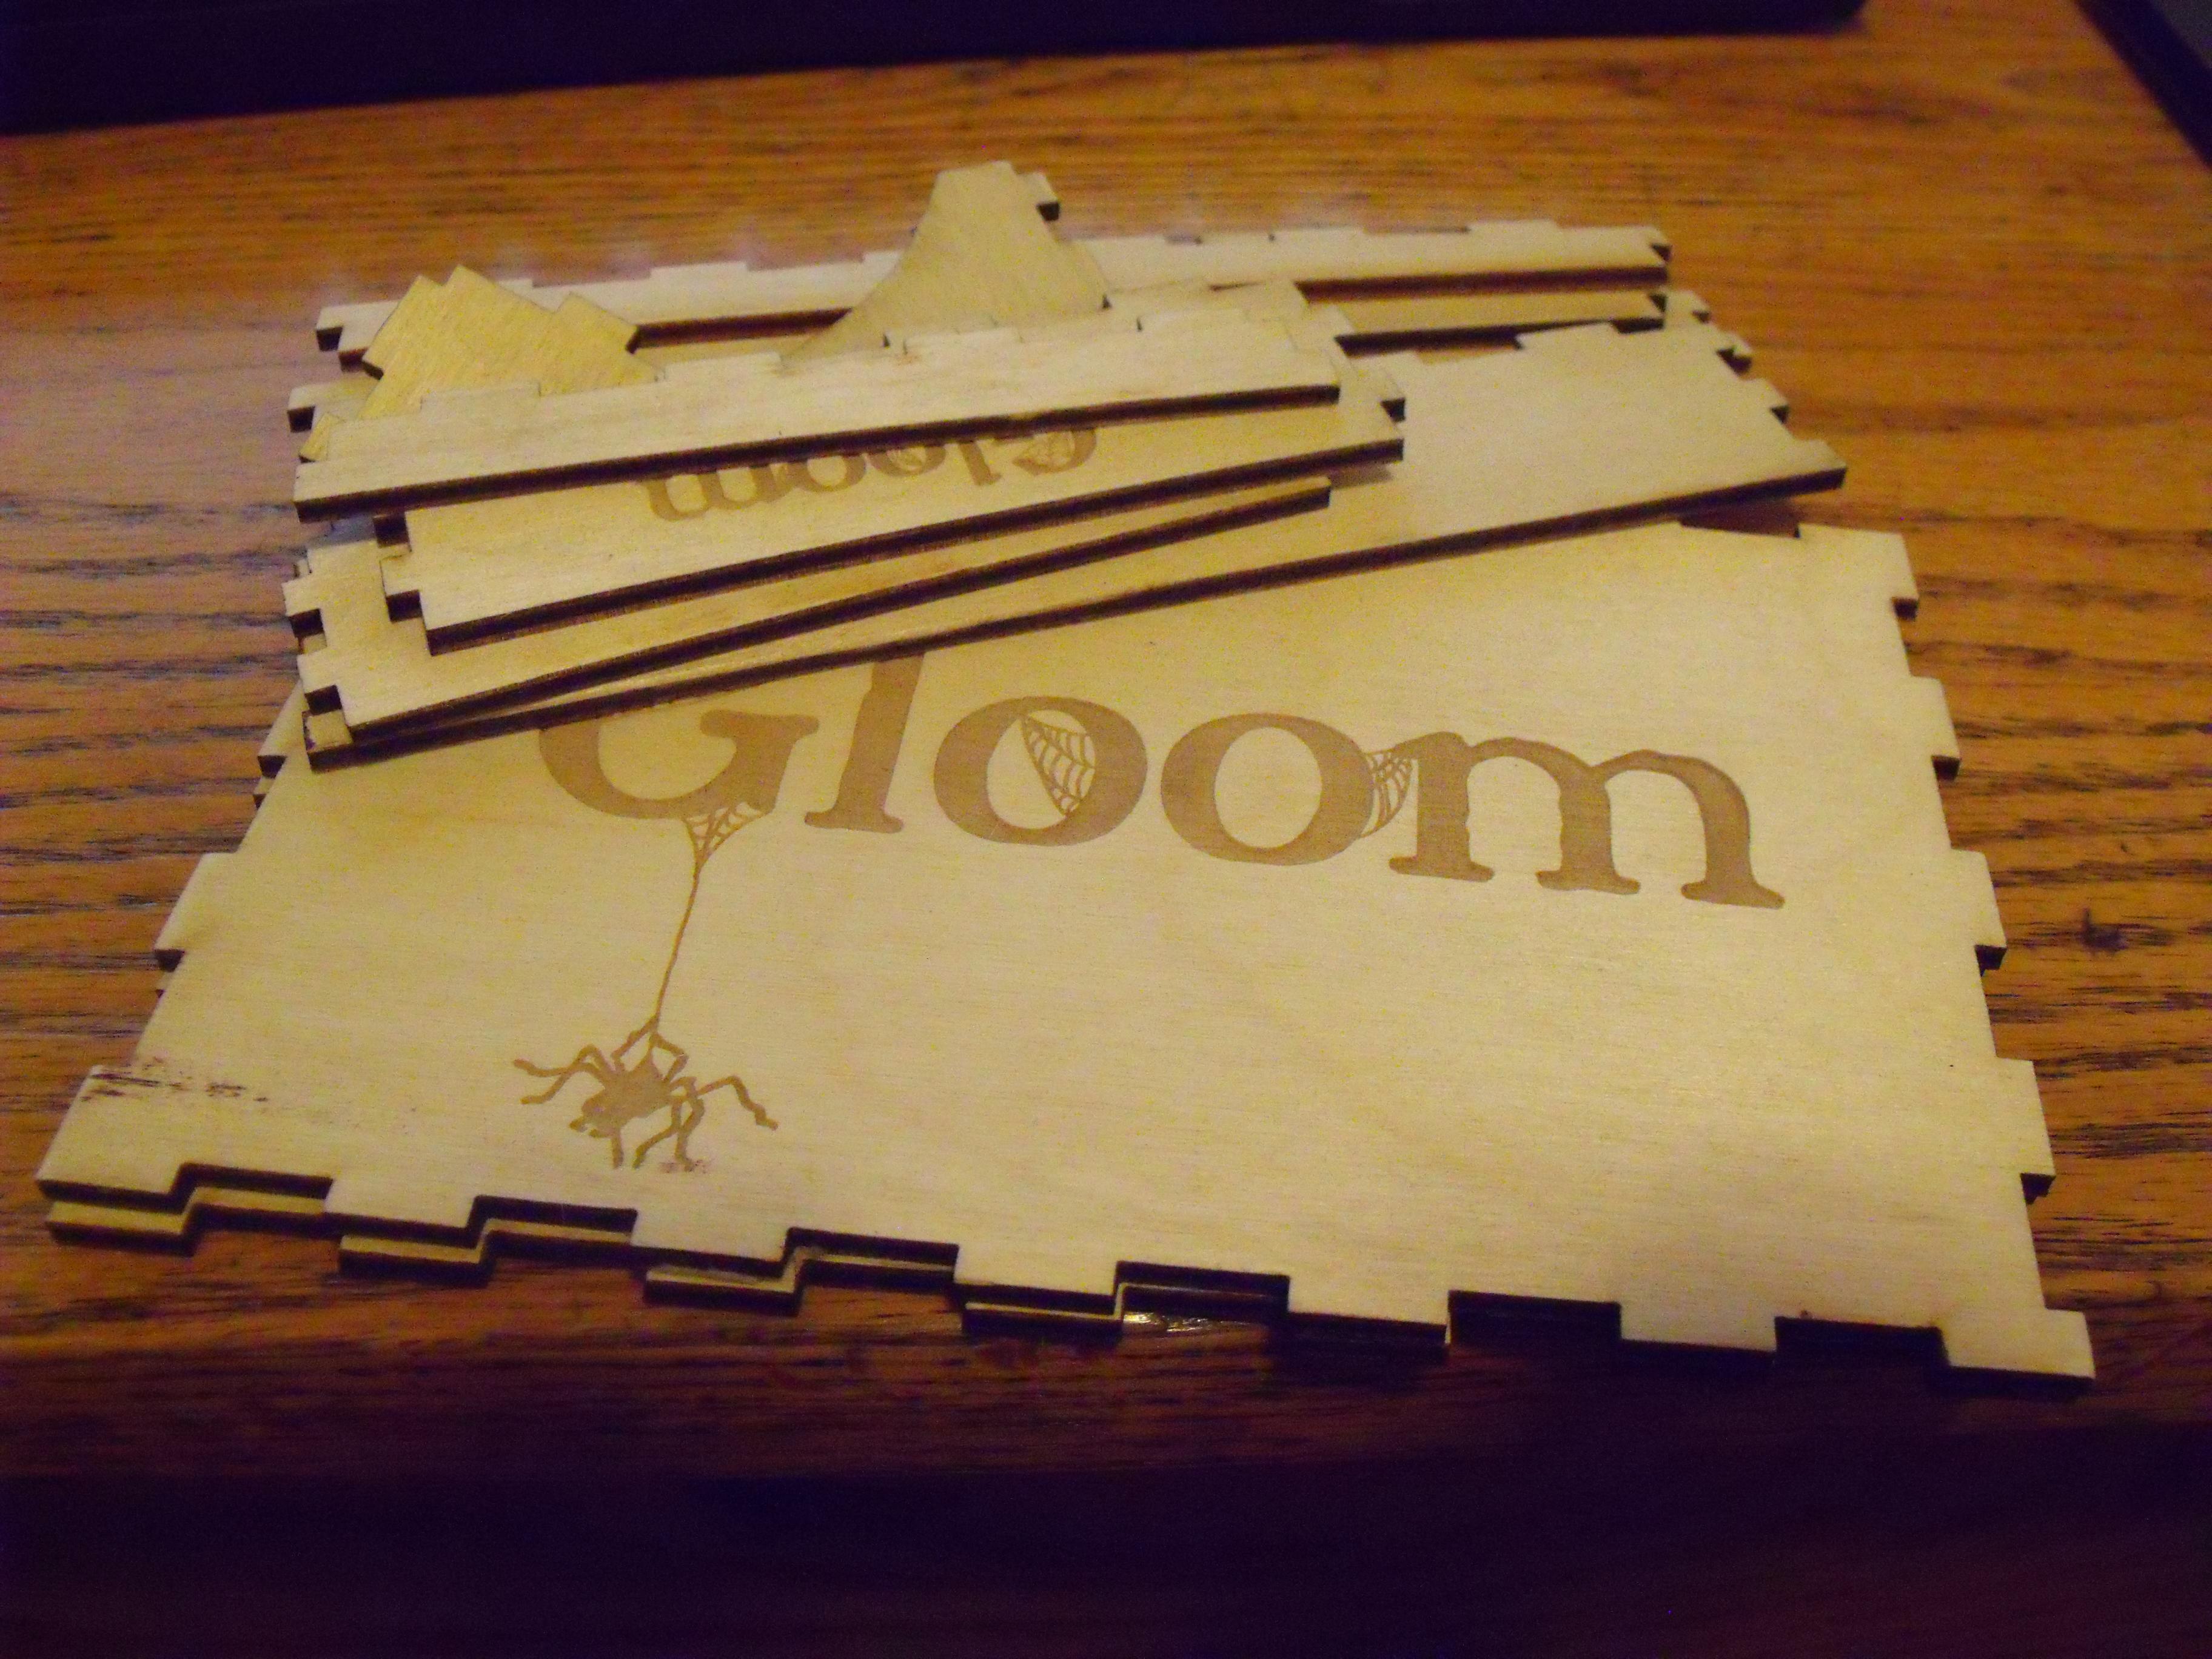 Gloom Box Parts